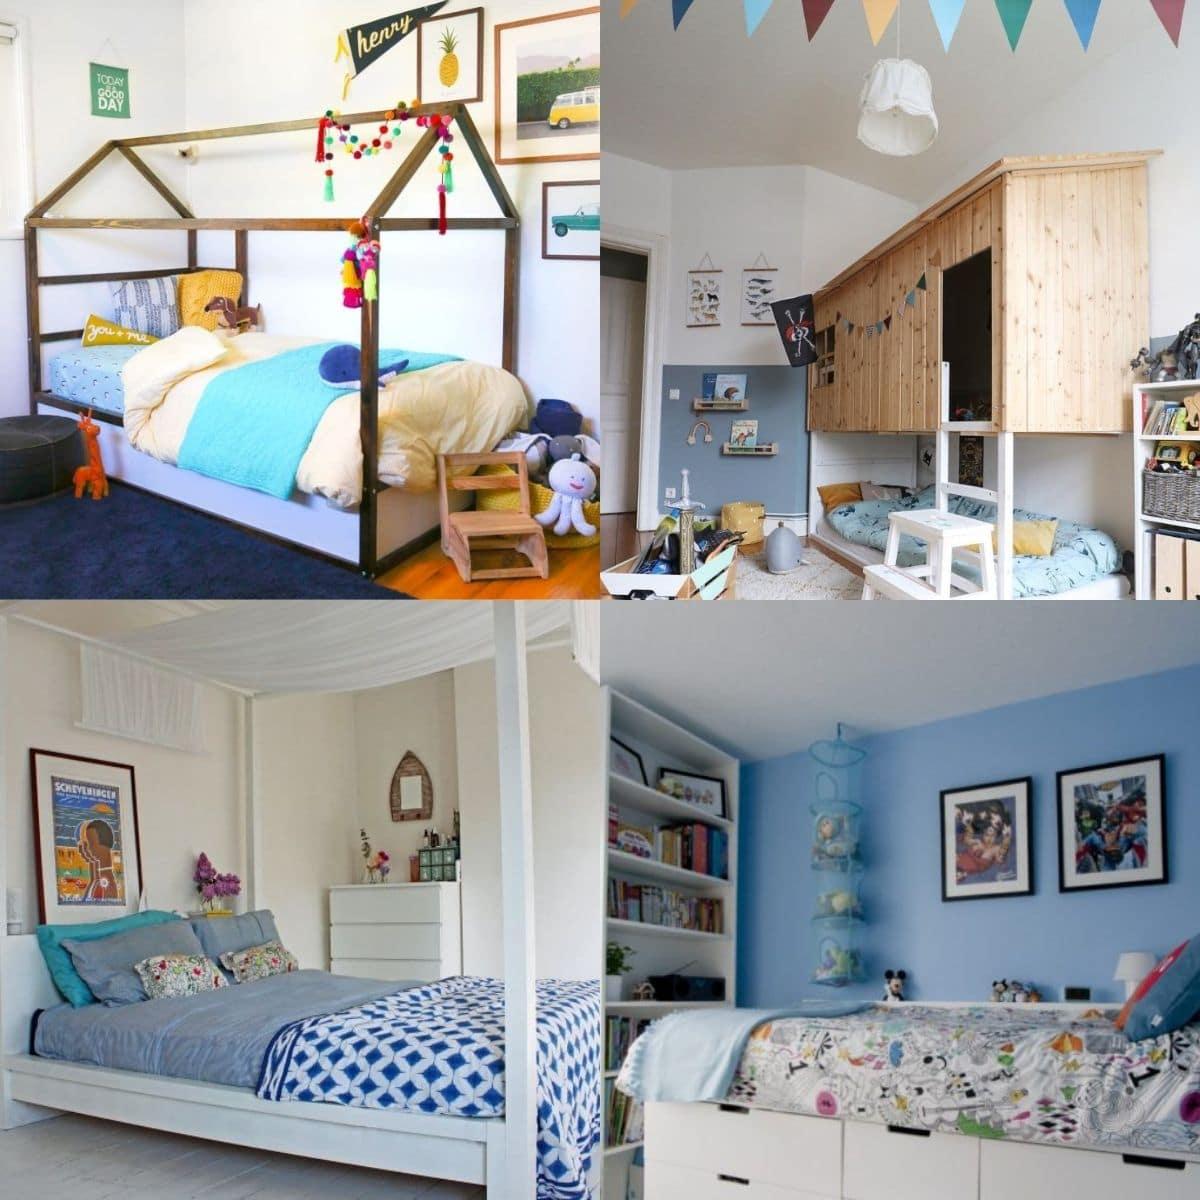 20 Beautiful Ikea Bed Hacks For Bedroom Craftsy